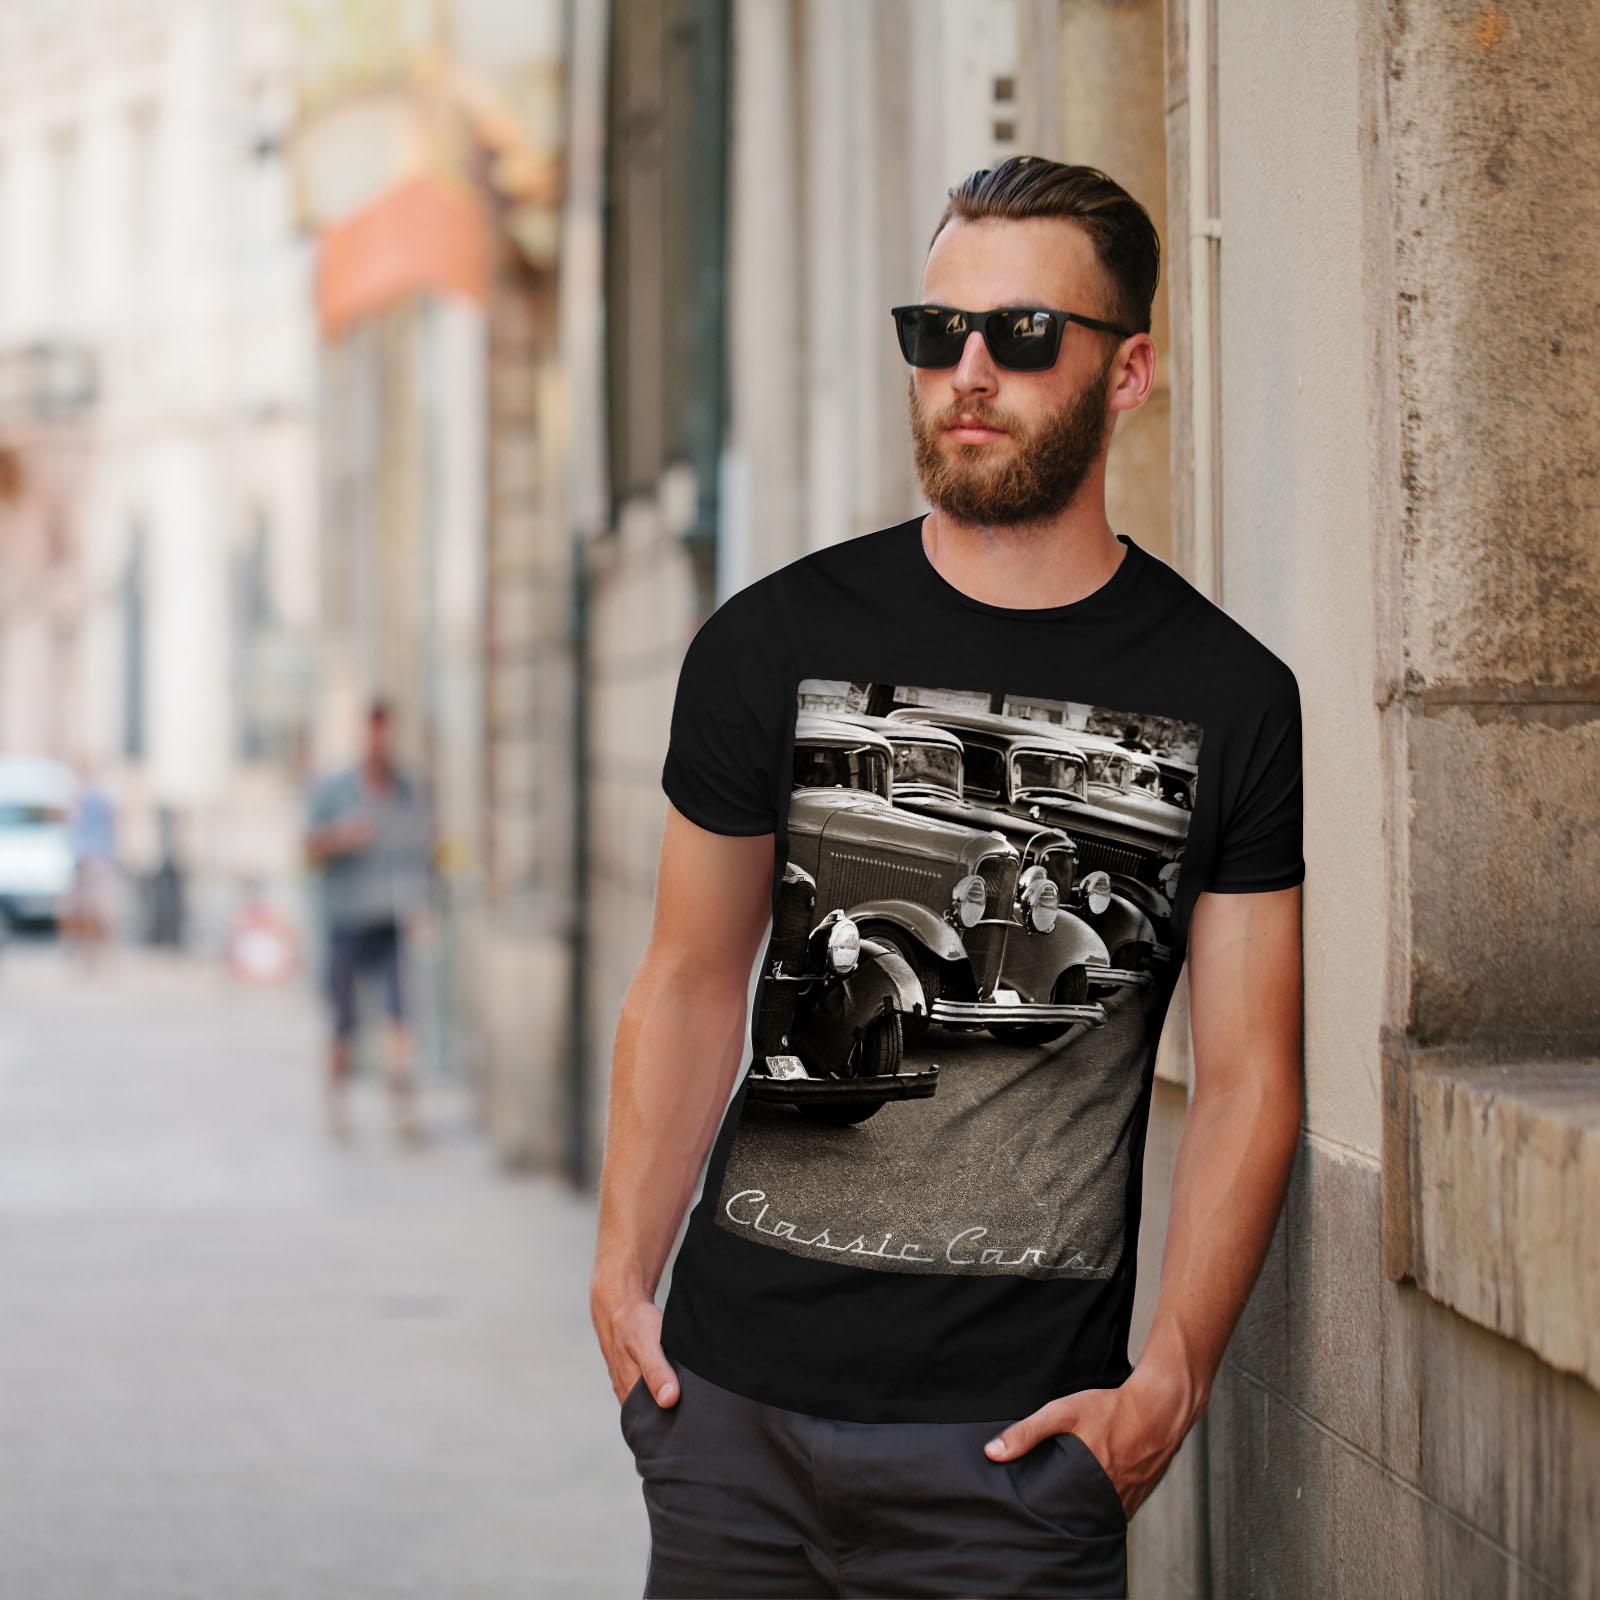 Wellcoda-Classic-Cars-Mens-T-shirt-Retro-Graphic-Design-Printed-Tee thumbnail 5